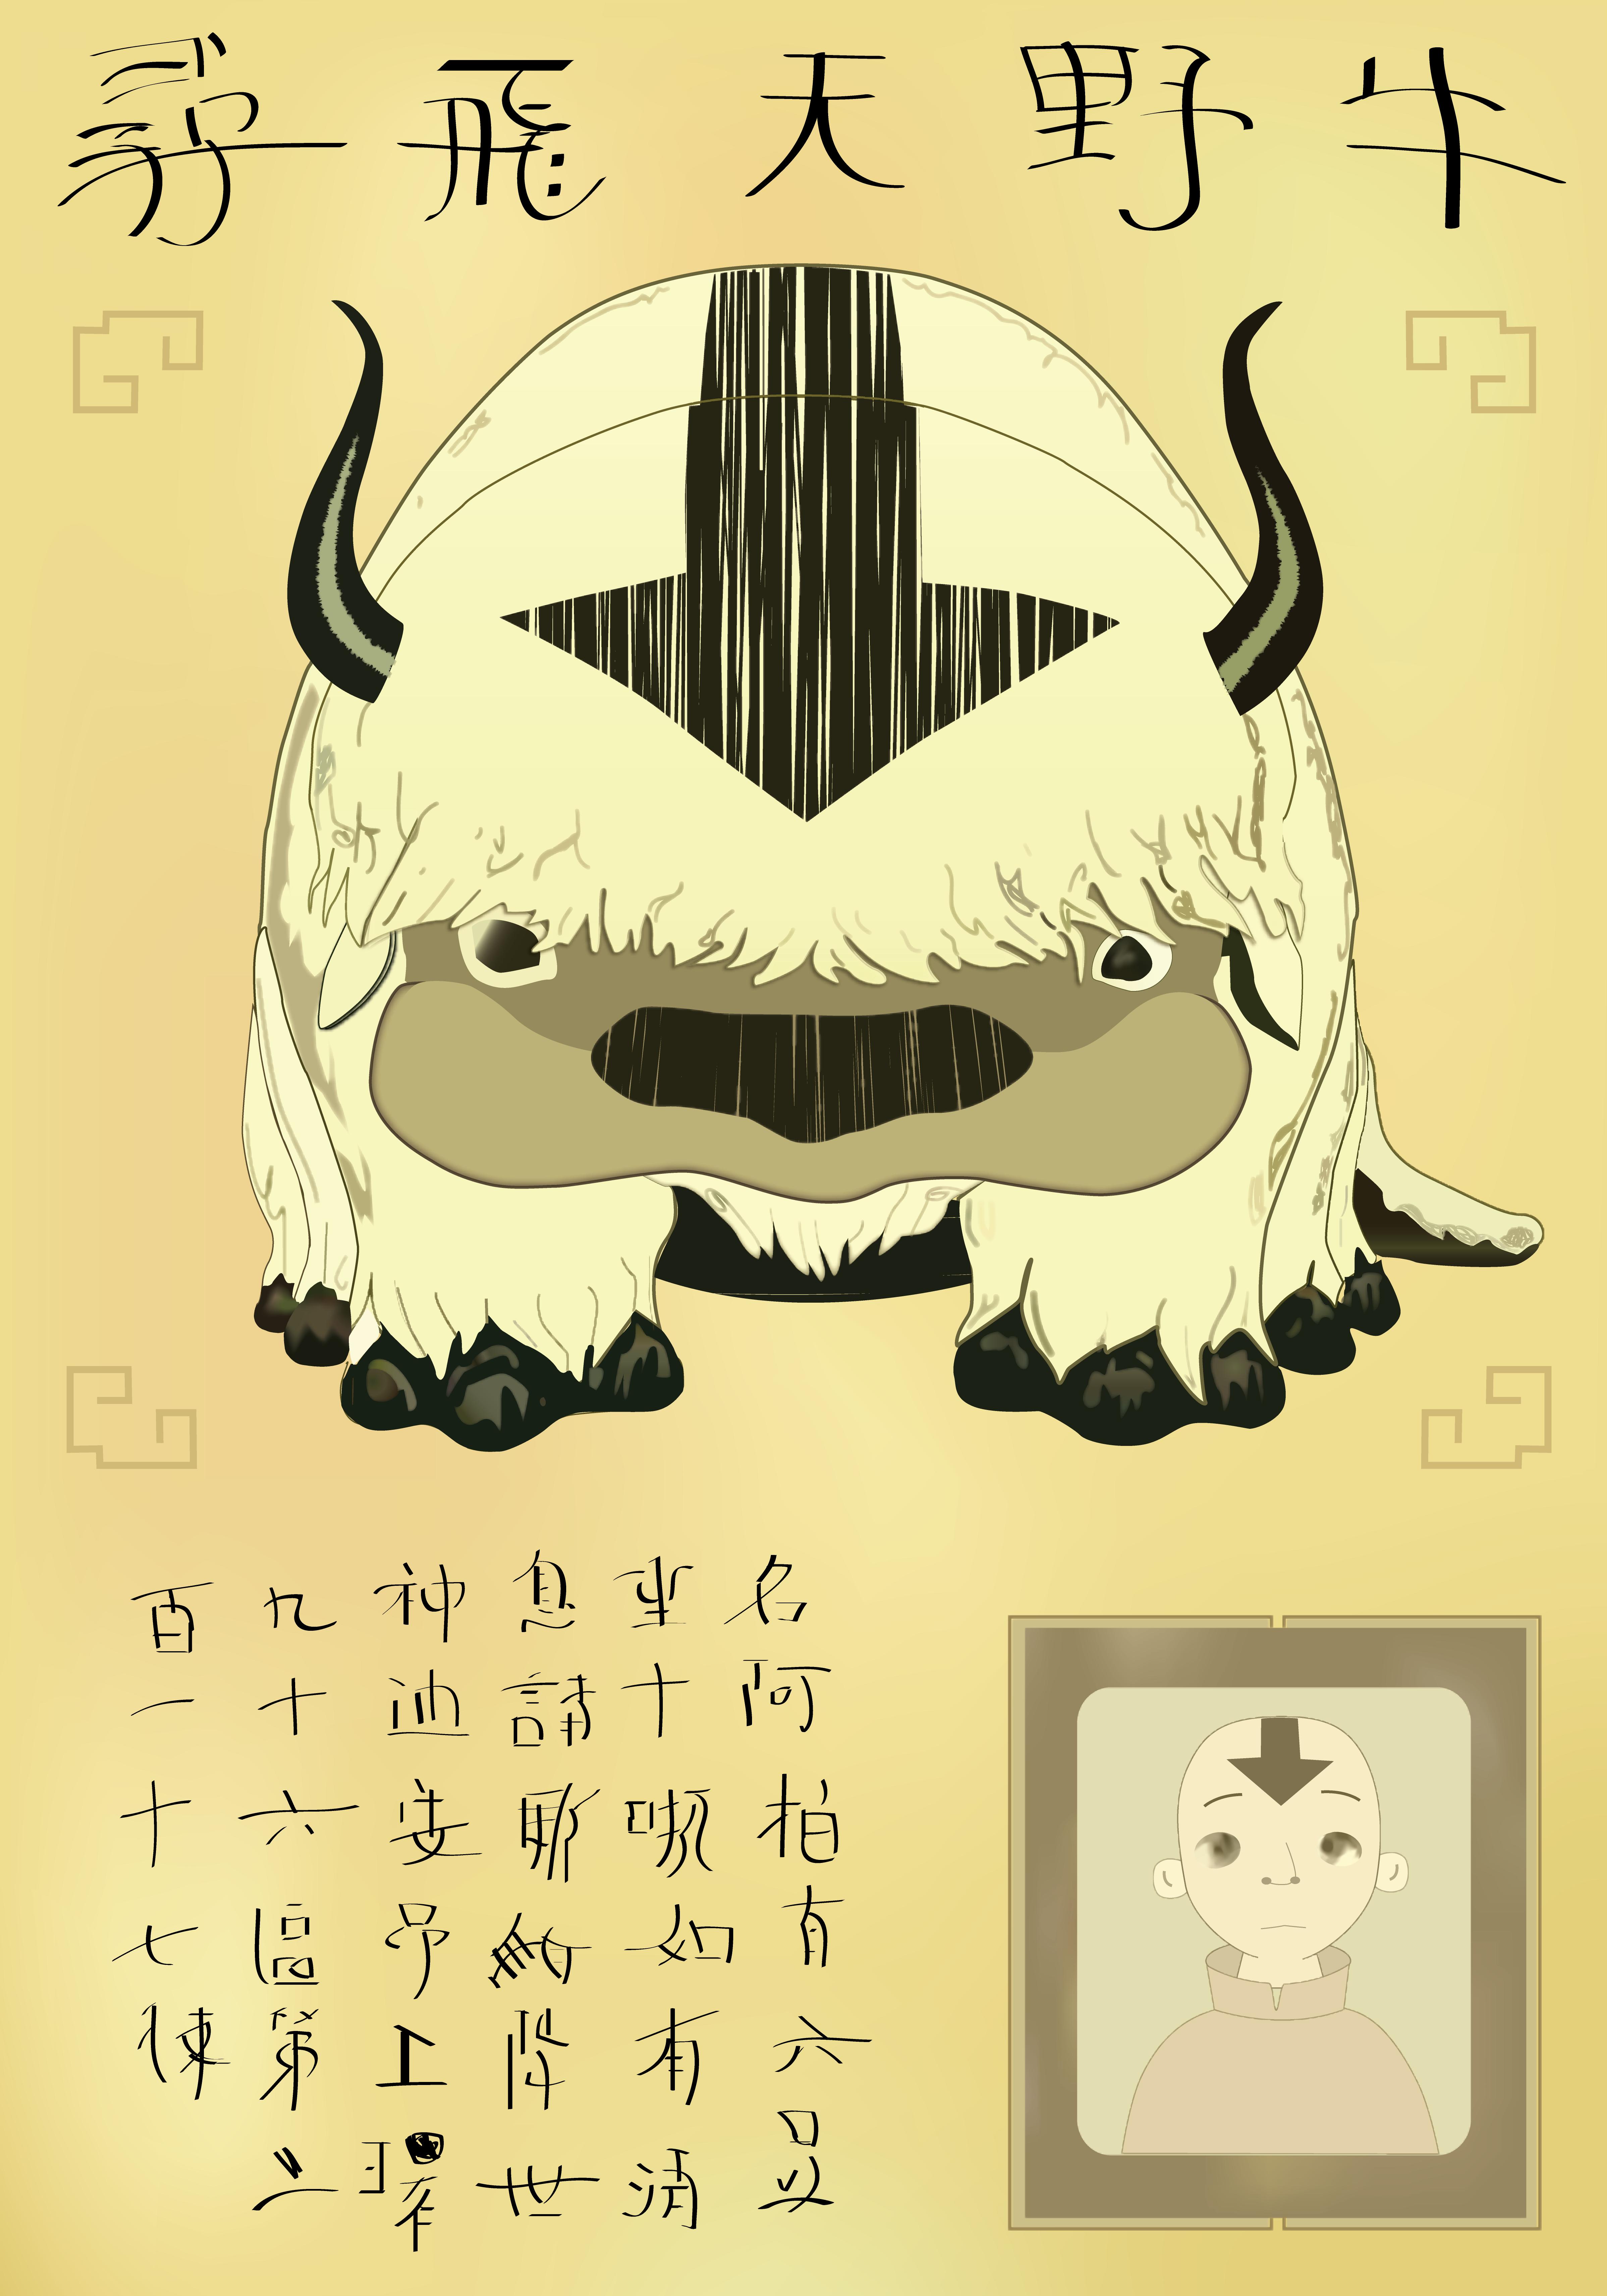 Lost sky bison poster... I think I still like Sokka's